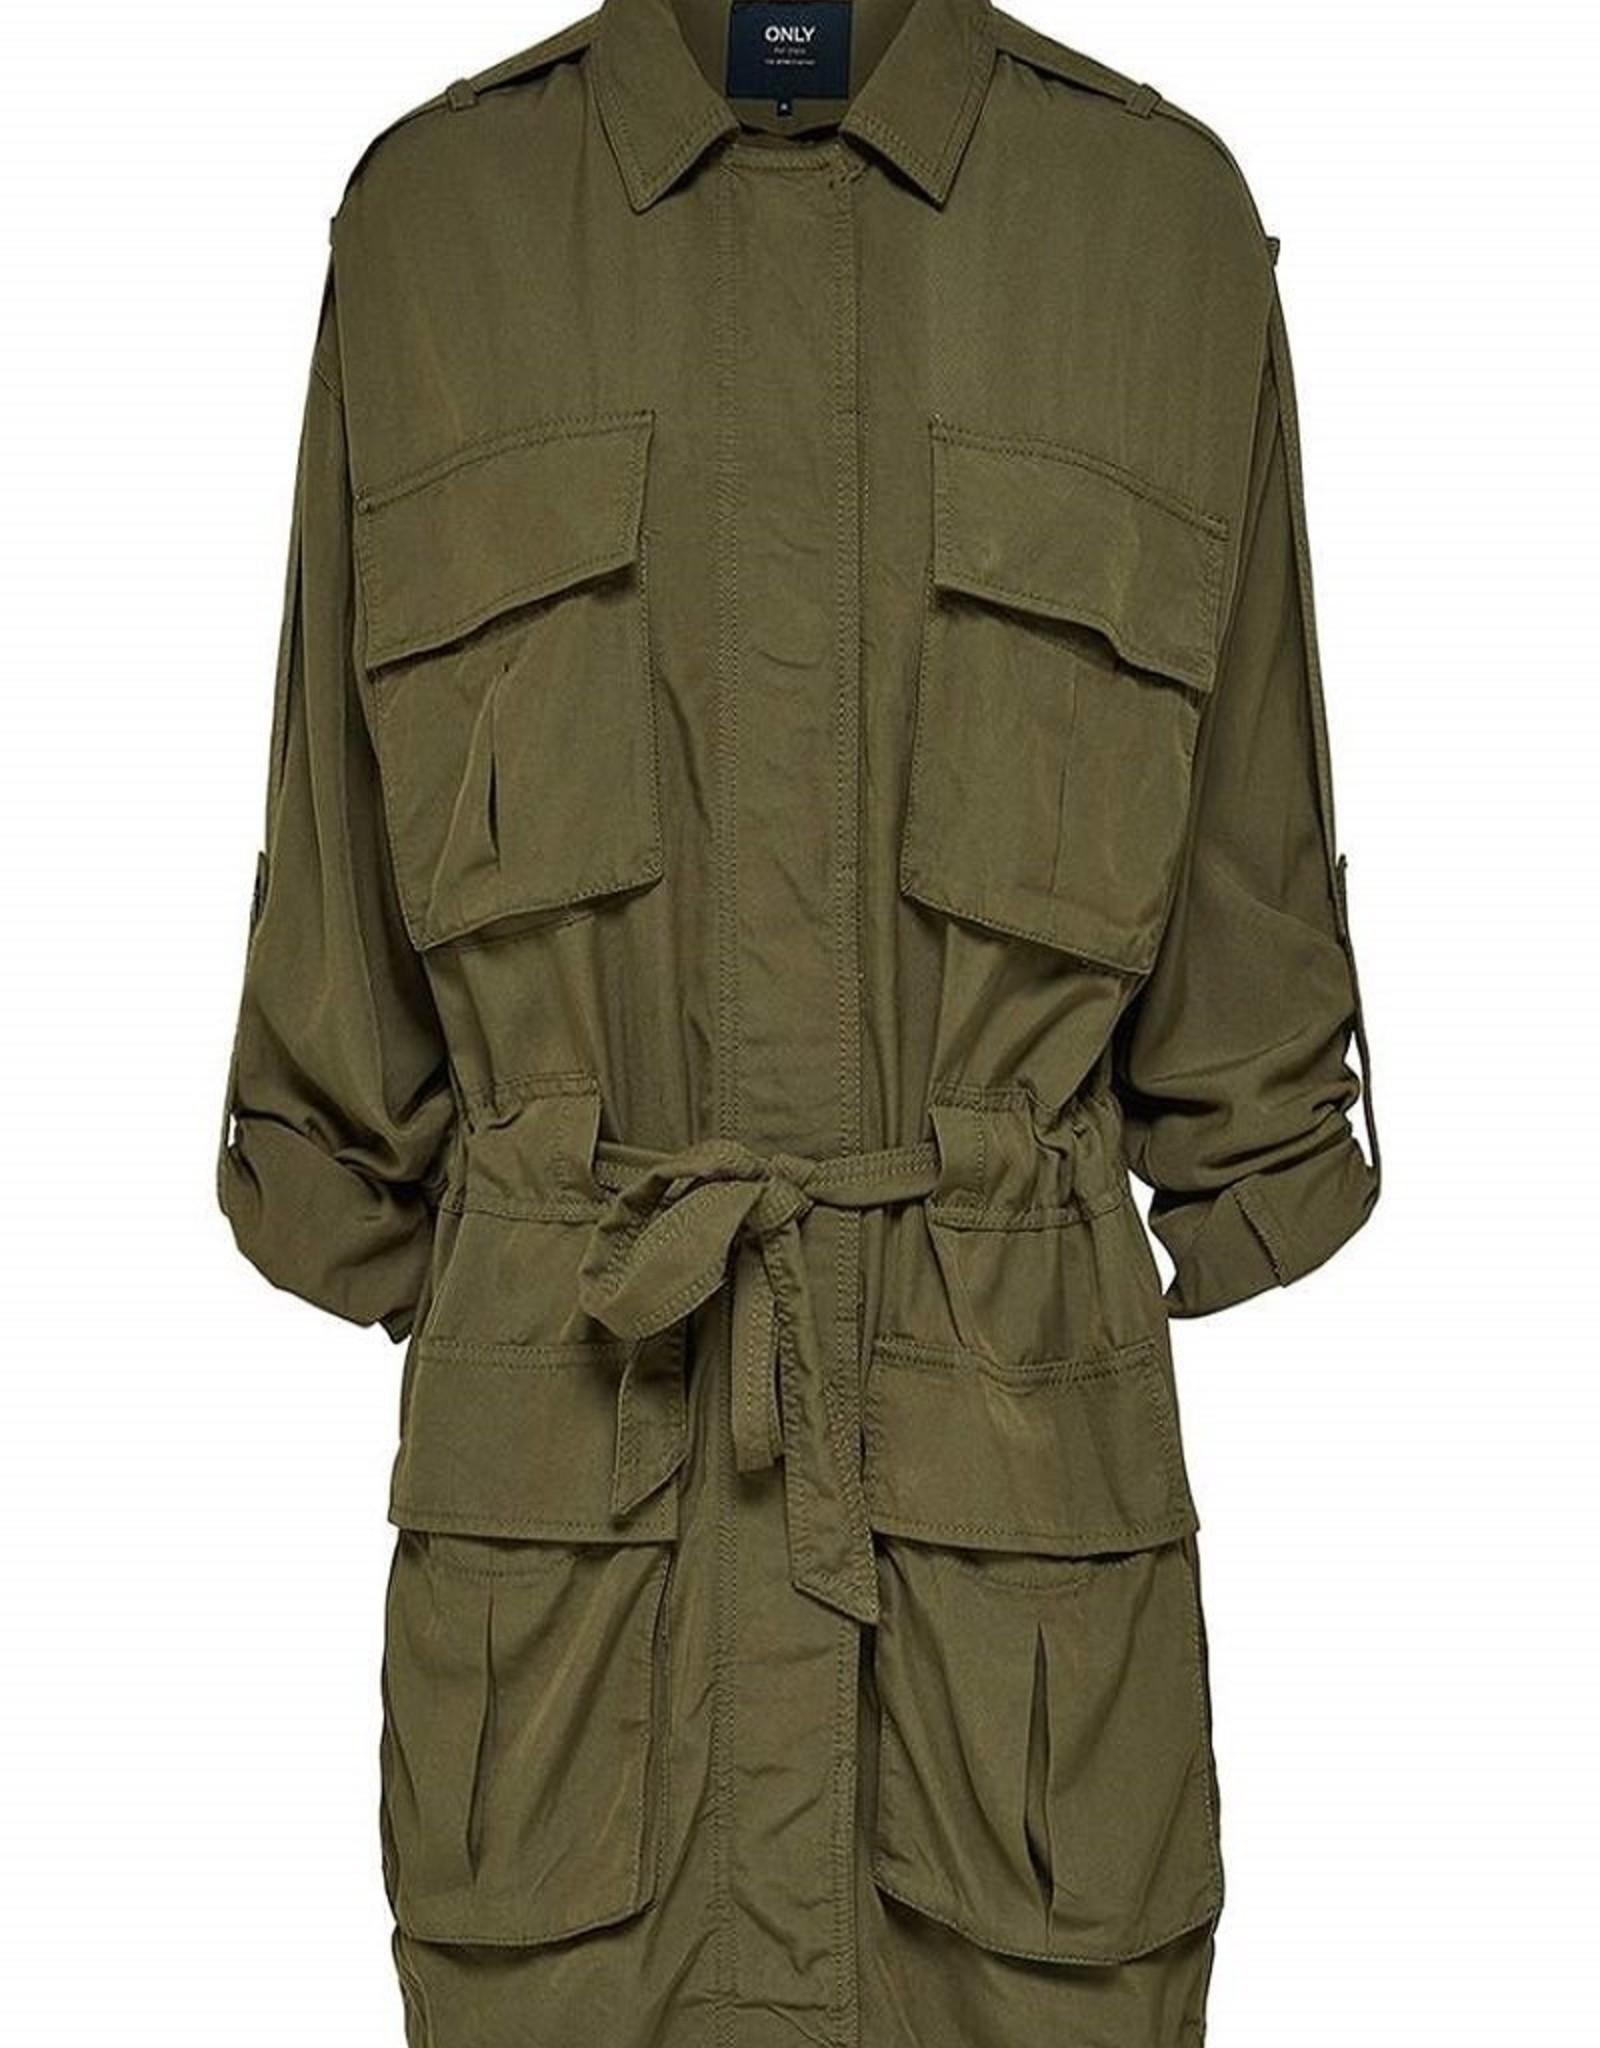 ONLY Gothic Olive Jacket